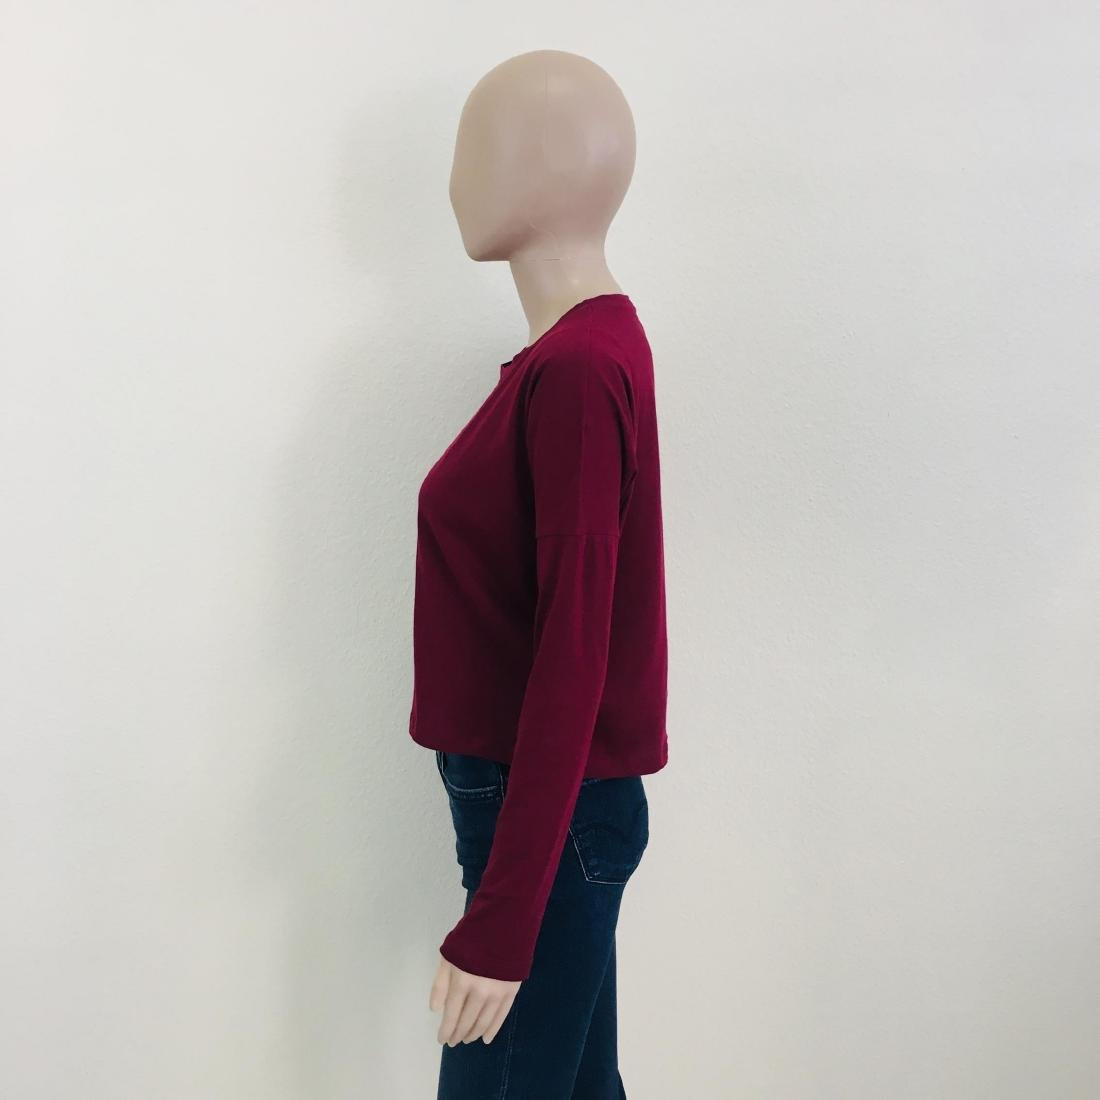 New Women's ZARA Top Blouse Size S - 6